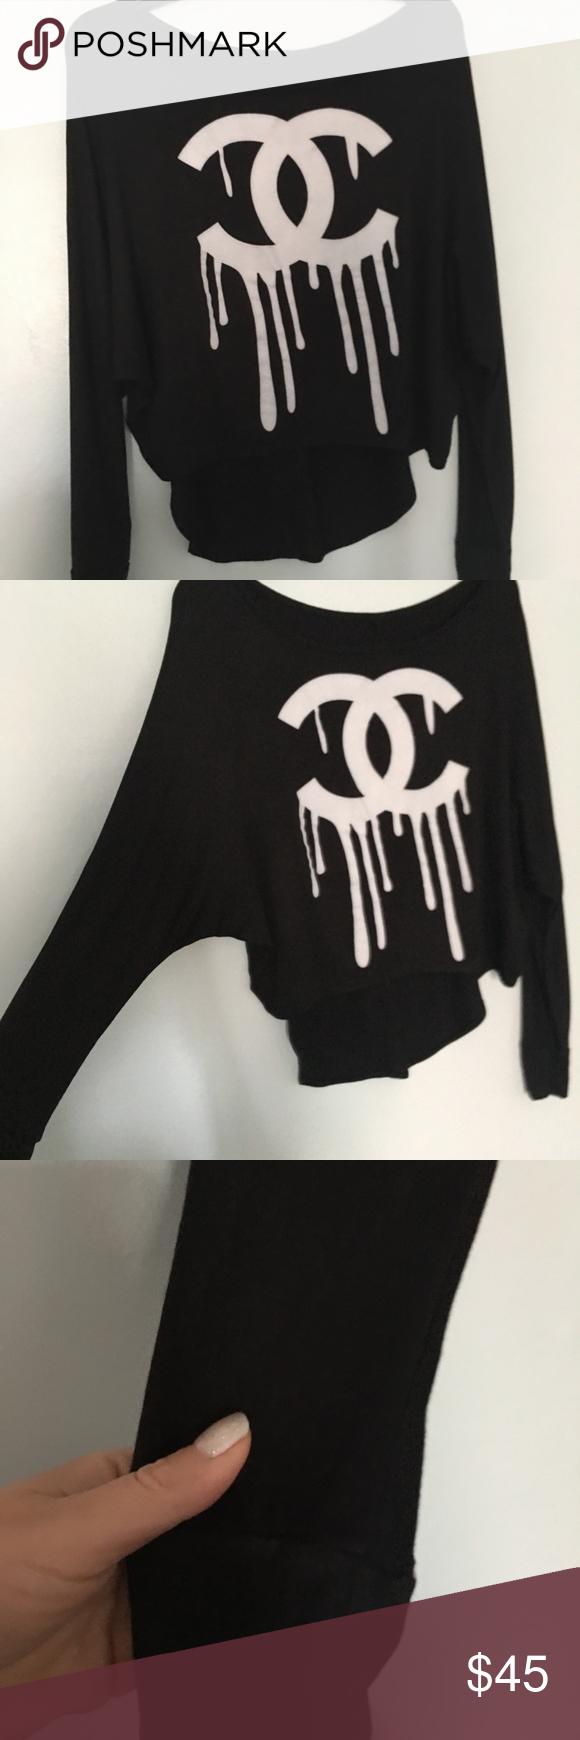 Chanel print logo long sleeve shirt Long sleeve shirts